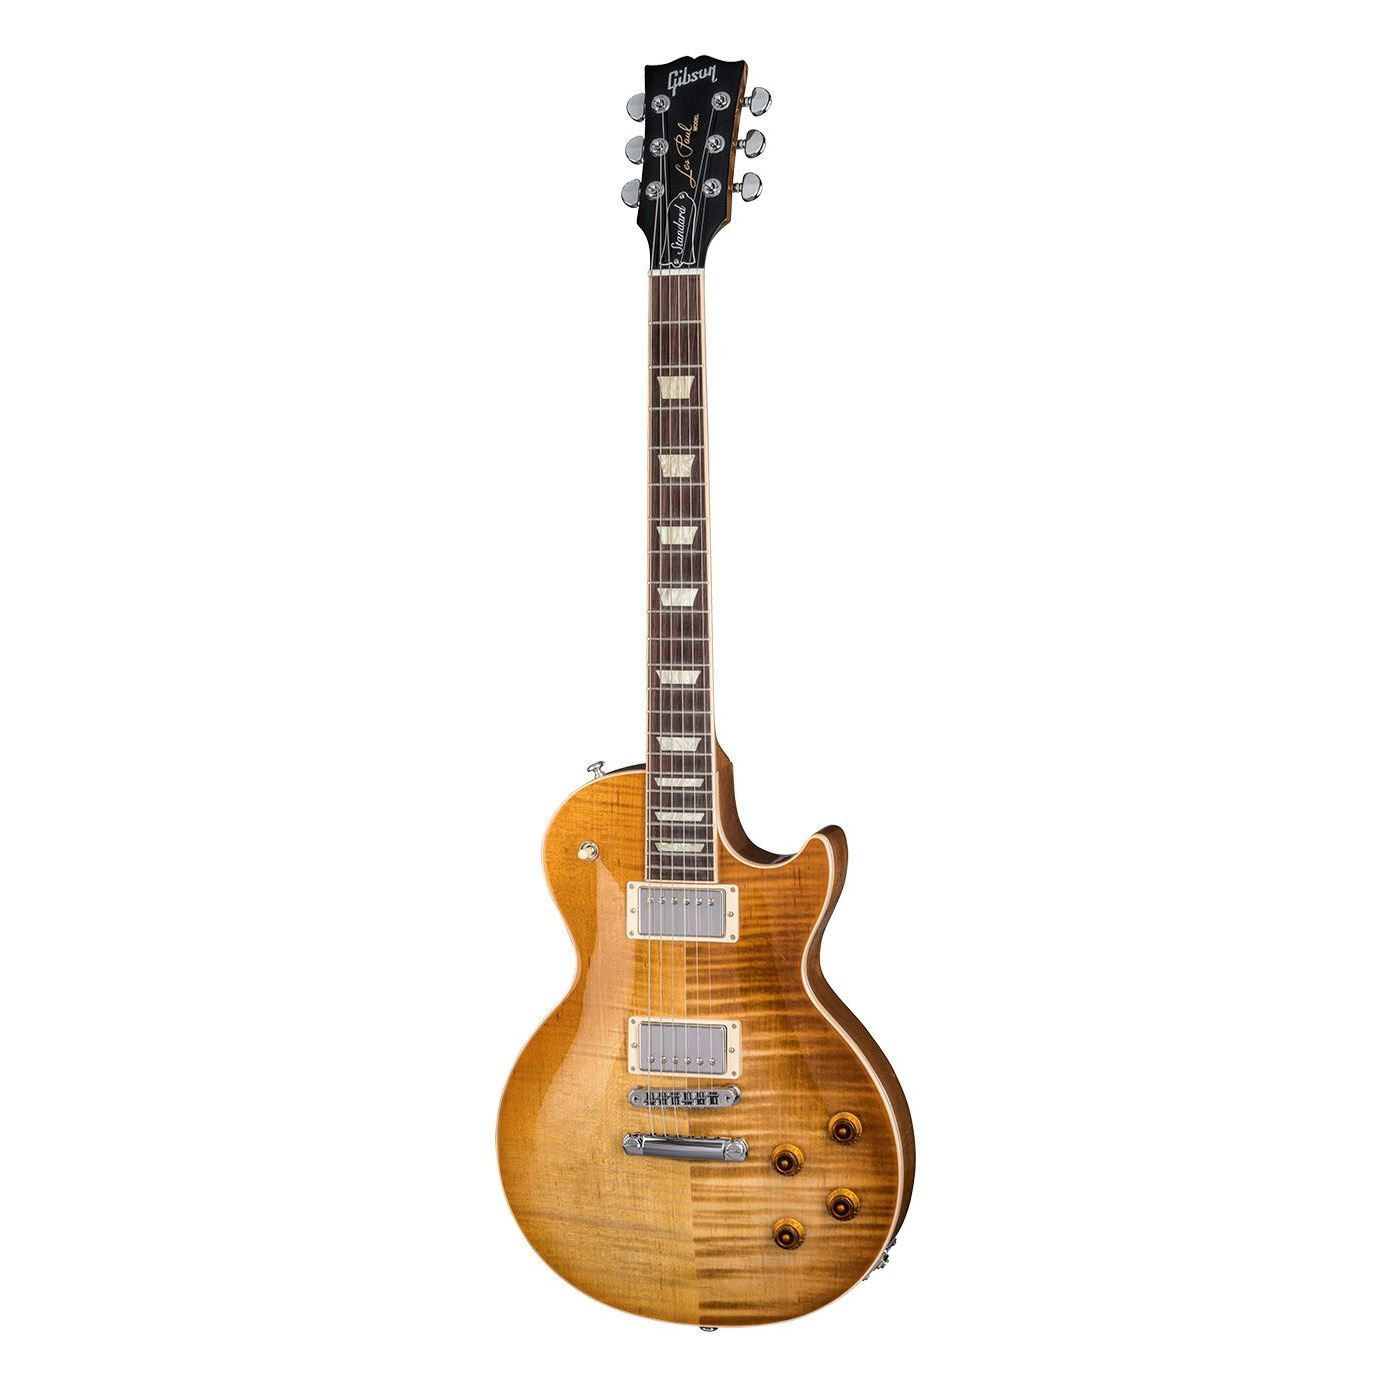 Gibson 2018 Les Paul Standard Electric Guitar Mojave Burst